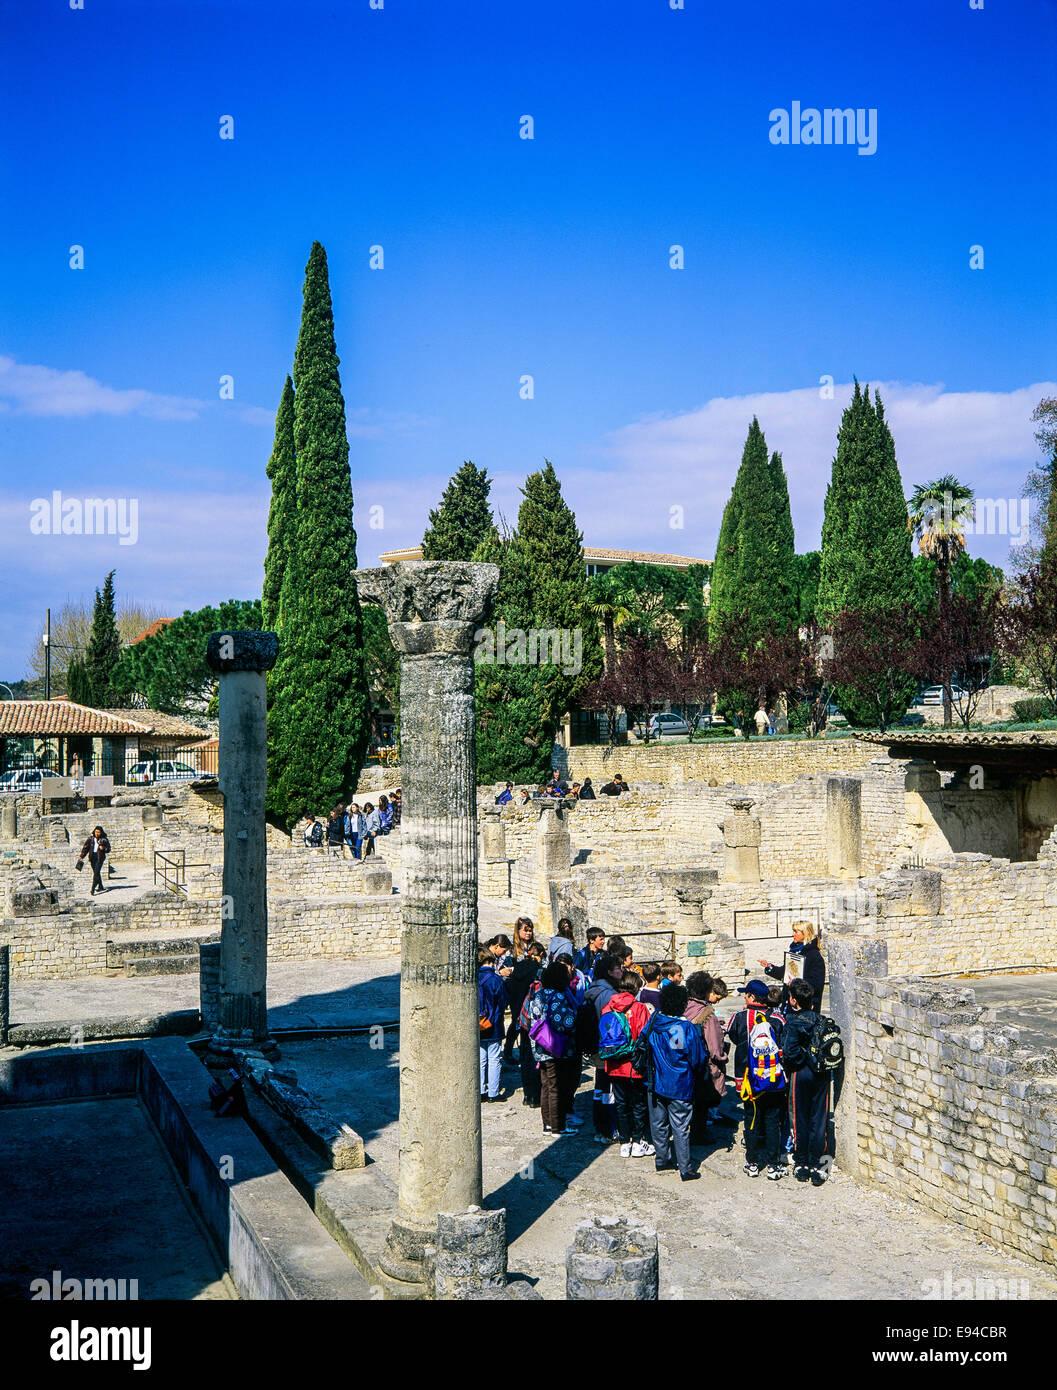 House of the Messii Puymin quarter Roman ruins Vaison-la-Romaine Provence France Europe - Stock Image